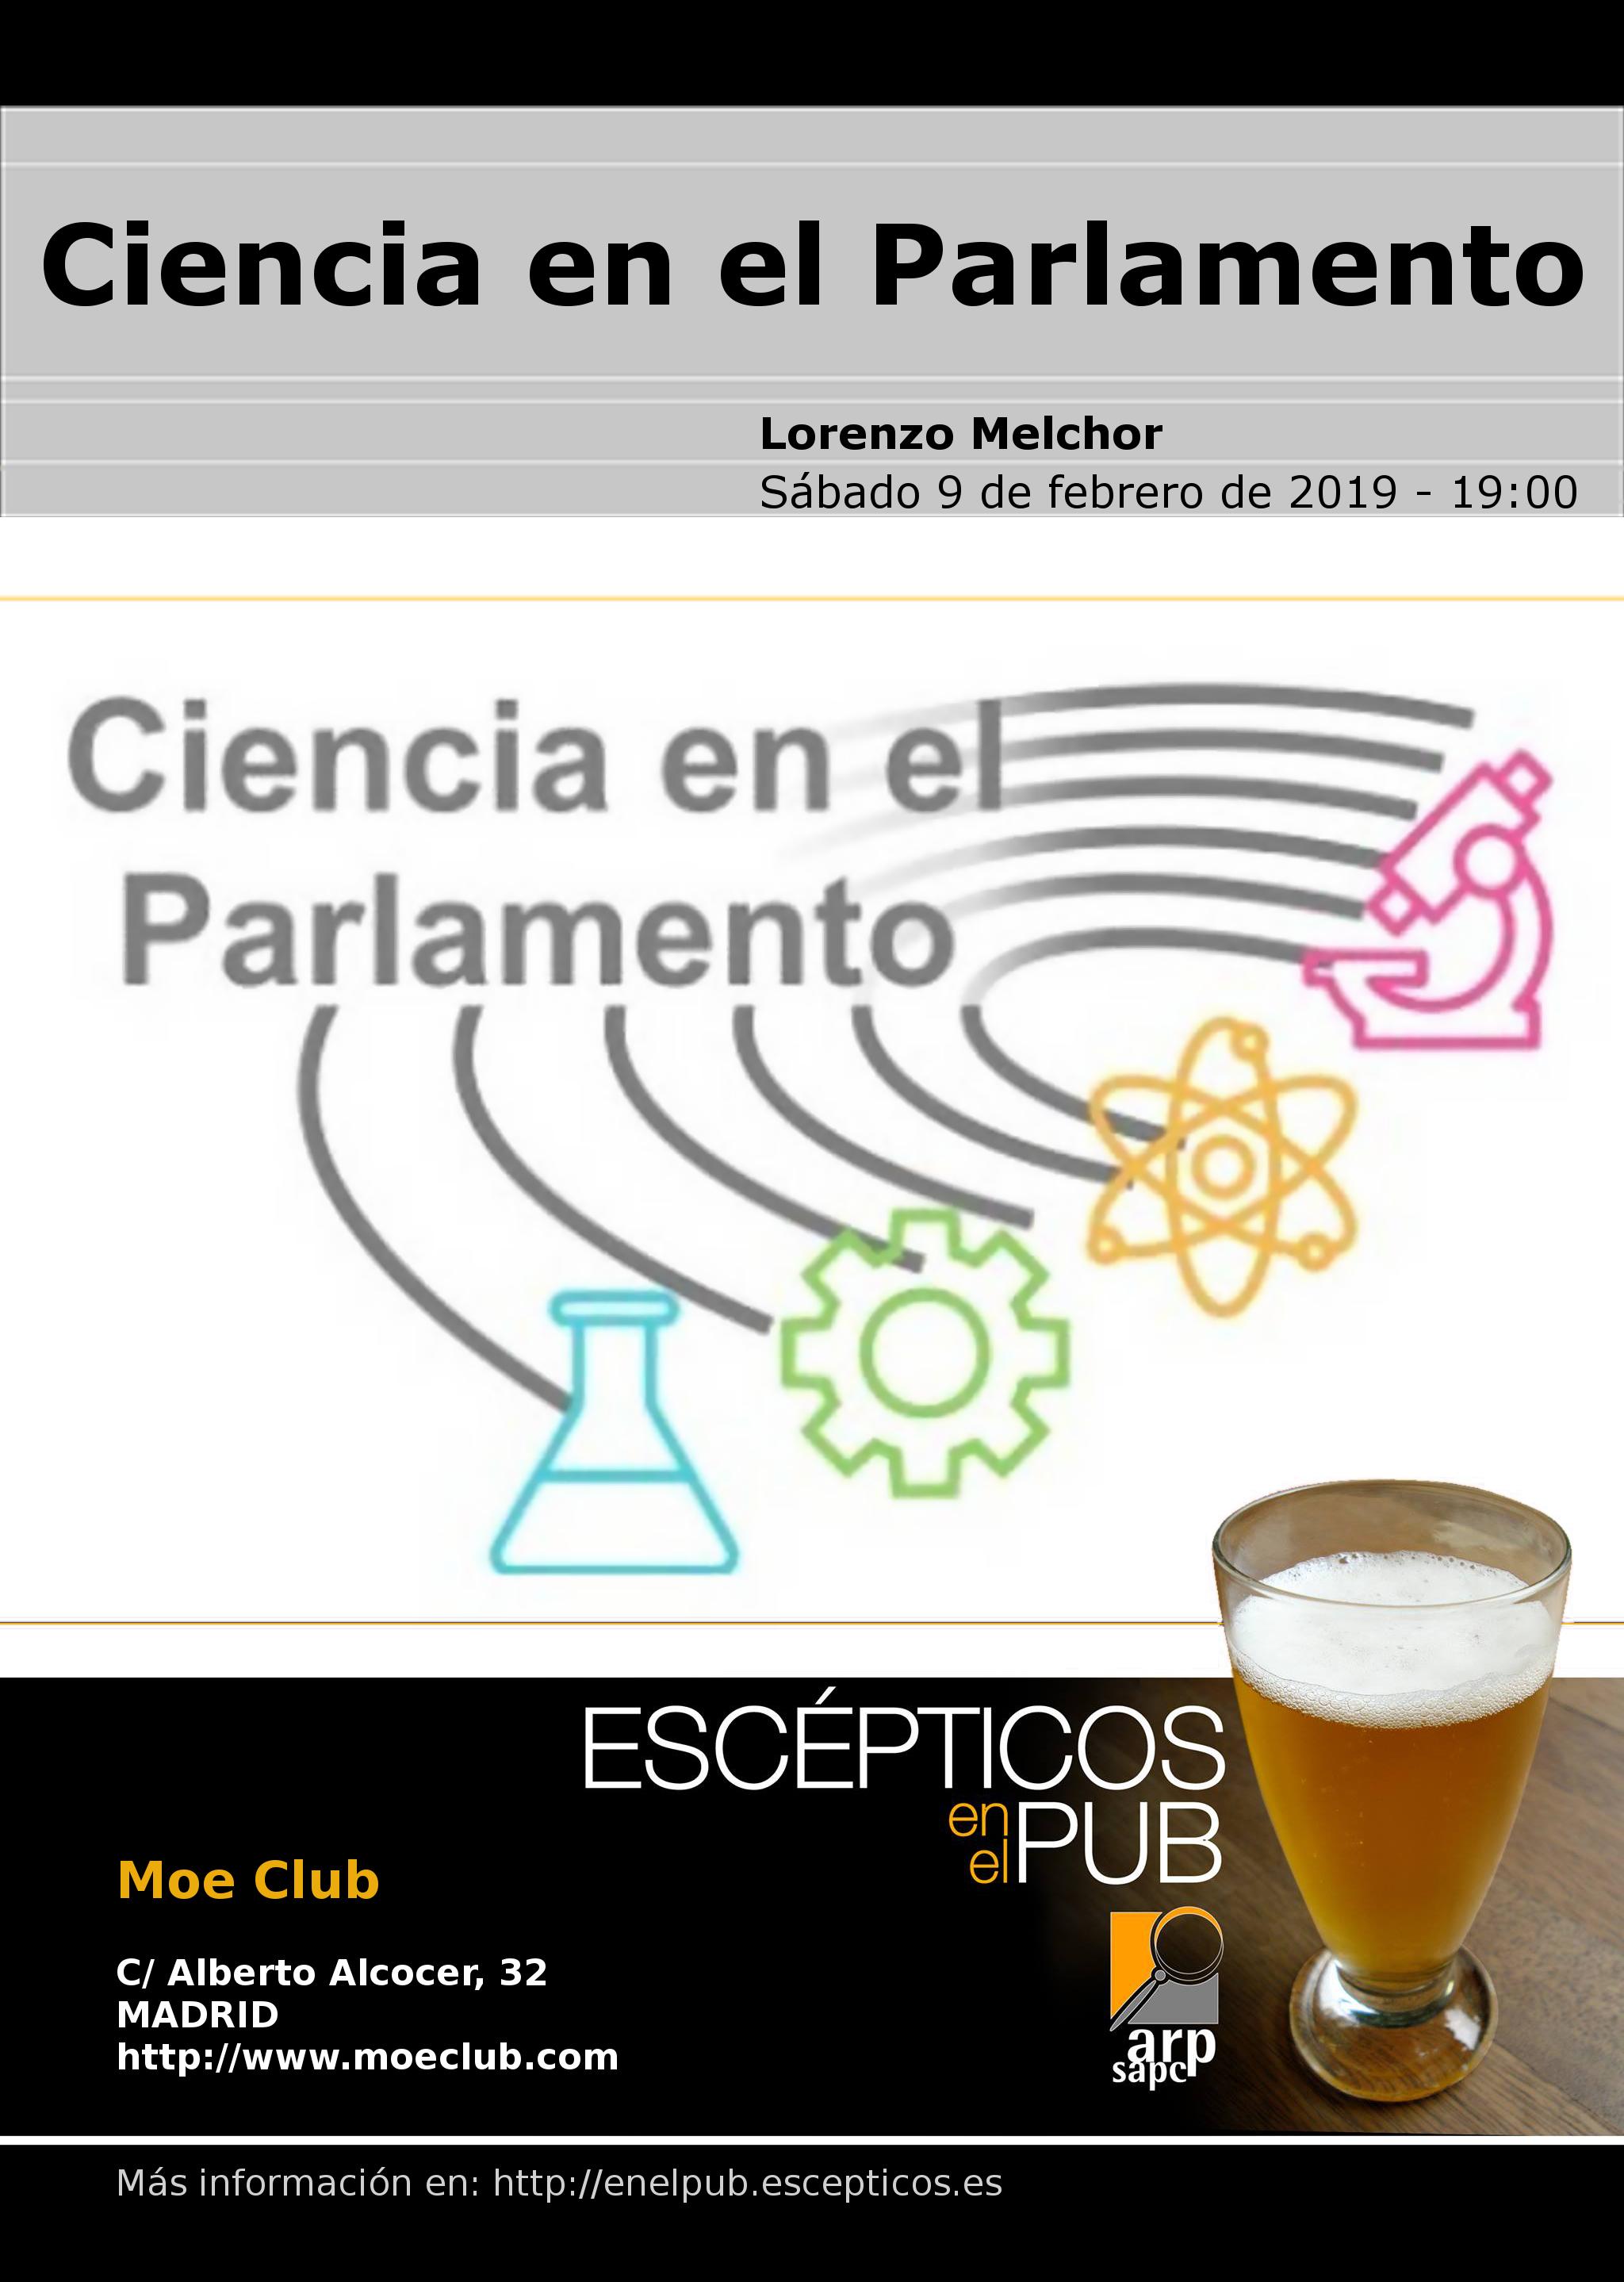 [Imagen: 20190209-EeeP_Madrid_HD.jpg]